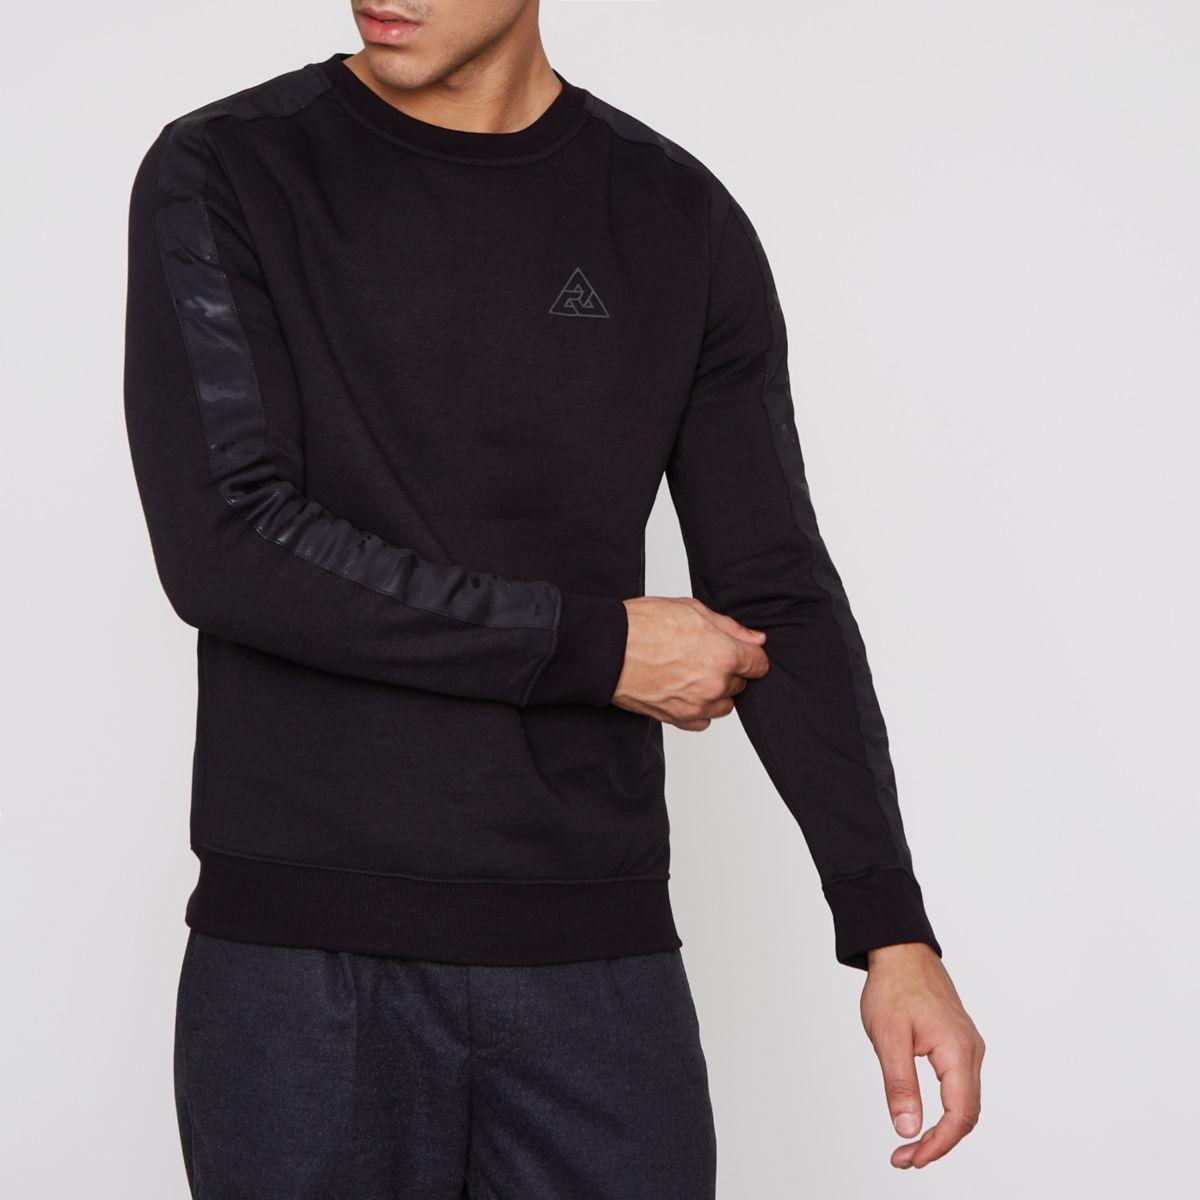 Black camo trim muscle fit sweatshirt